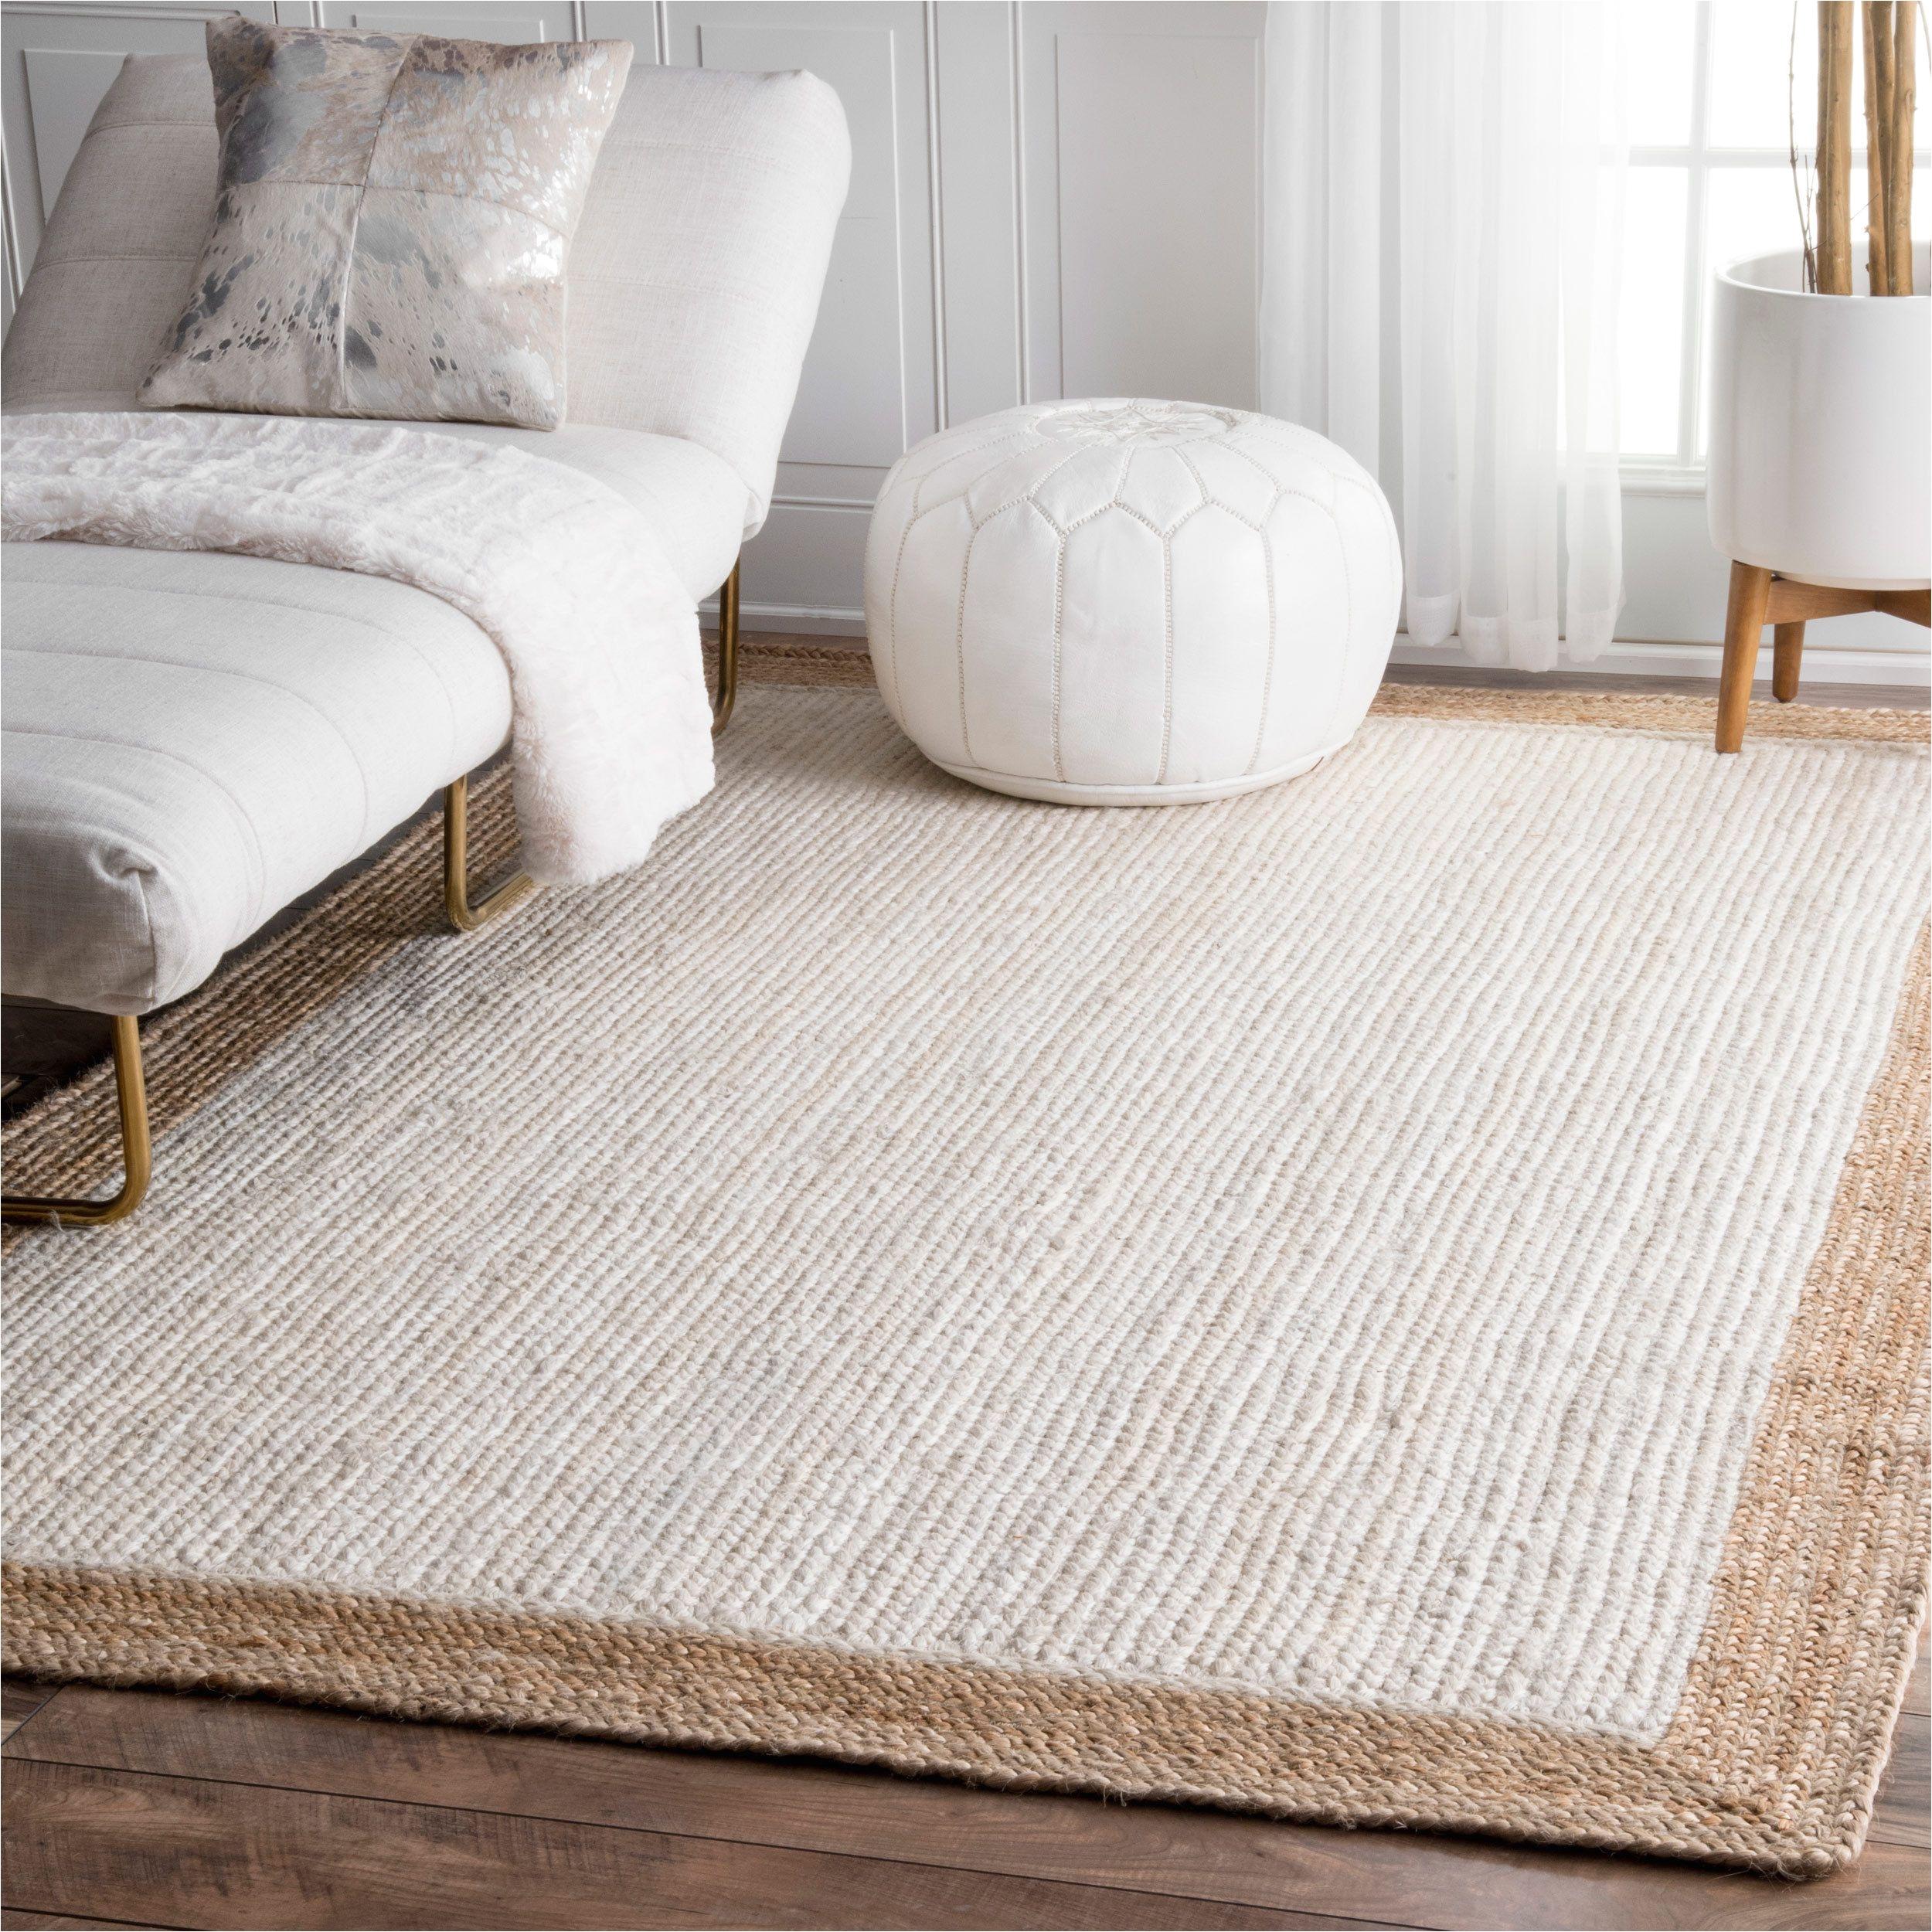 nuloom alexa eco natural fiber braided reversible border jute white rug 8 x 10 white beige size 8 x 10